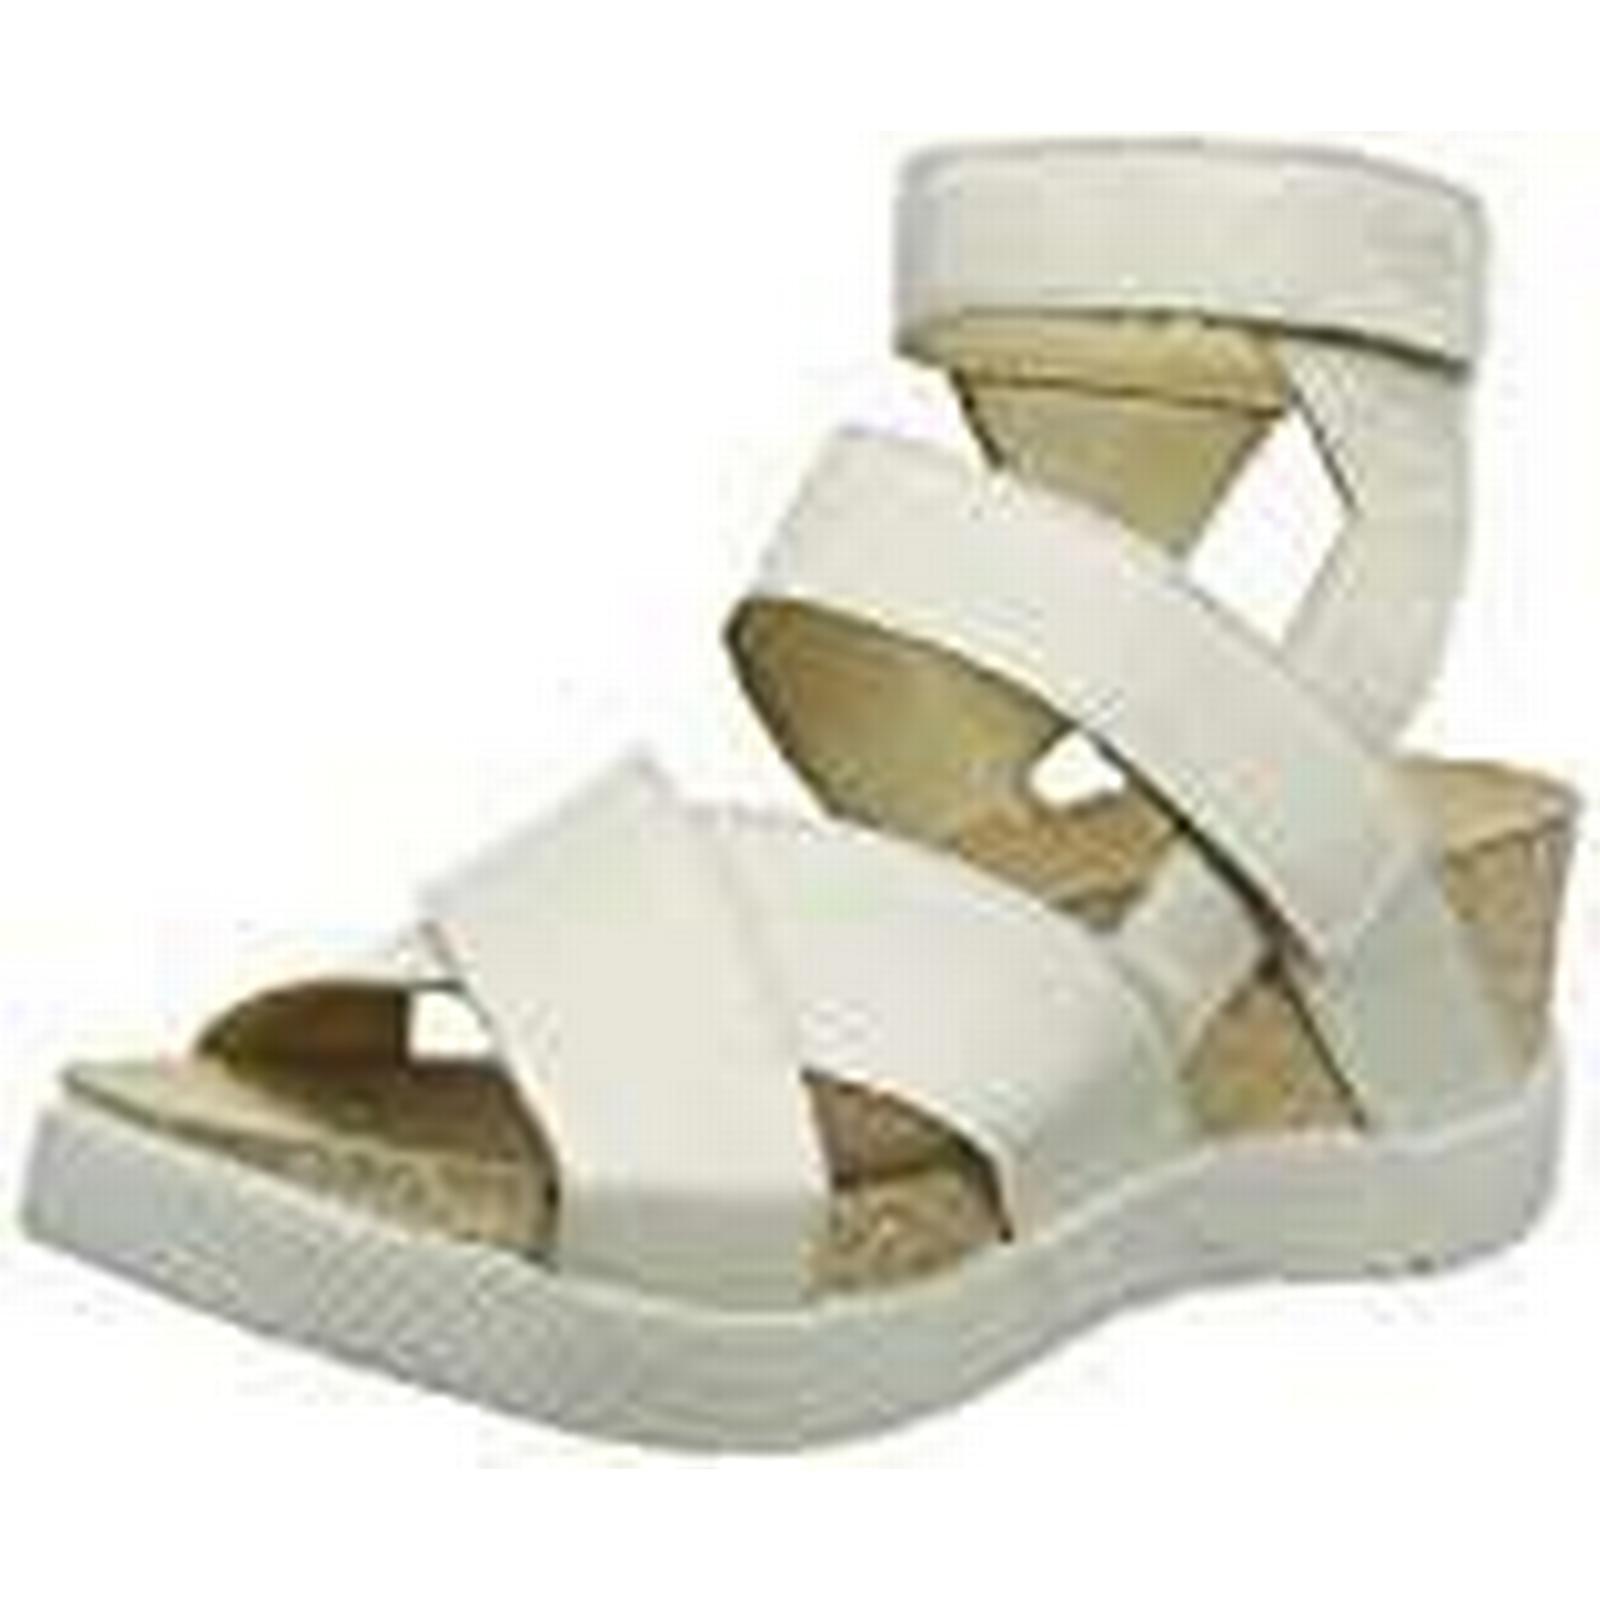 Fly London Women's 7 WEGE669FLY Gladiator Sandals, Off-White (Offwhite 010), 7 Women's (40 EU) 8021f6